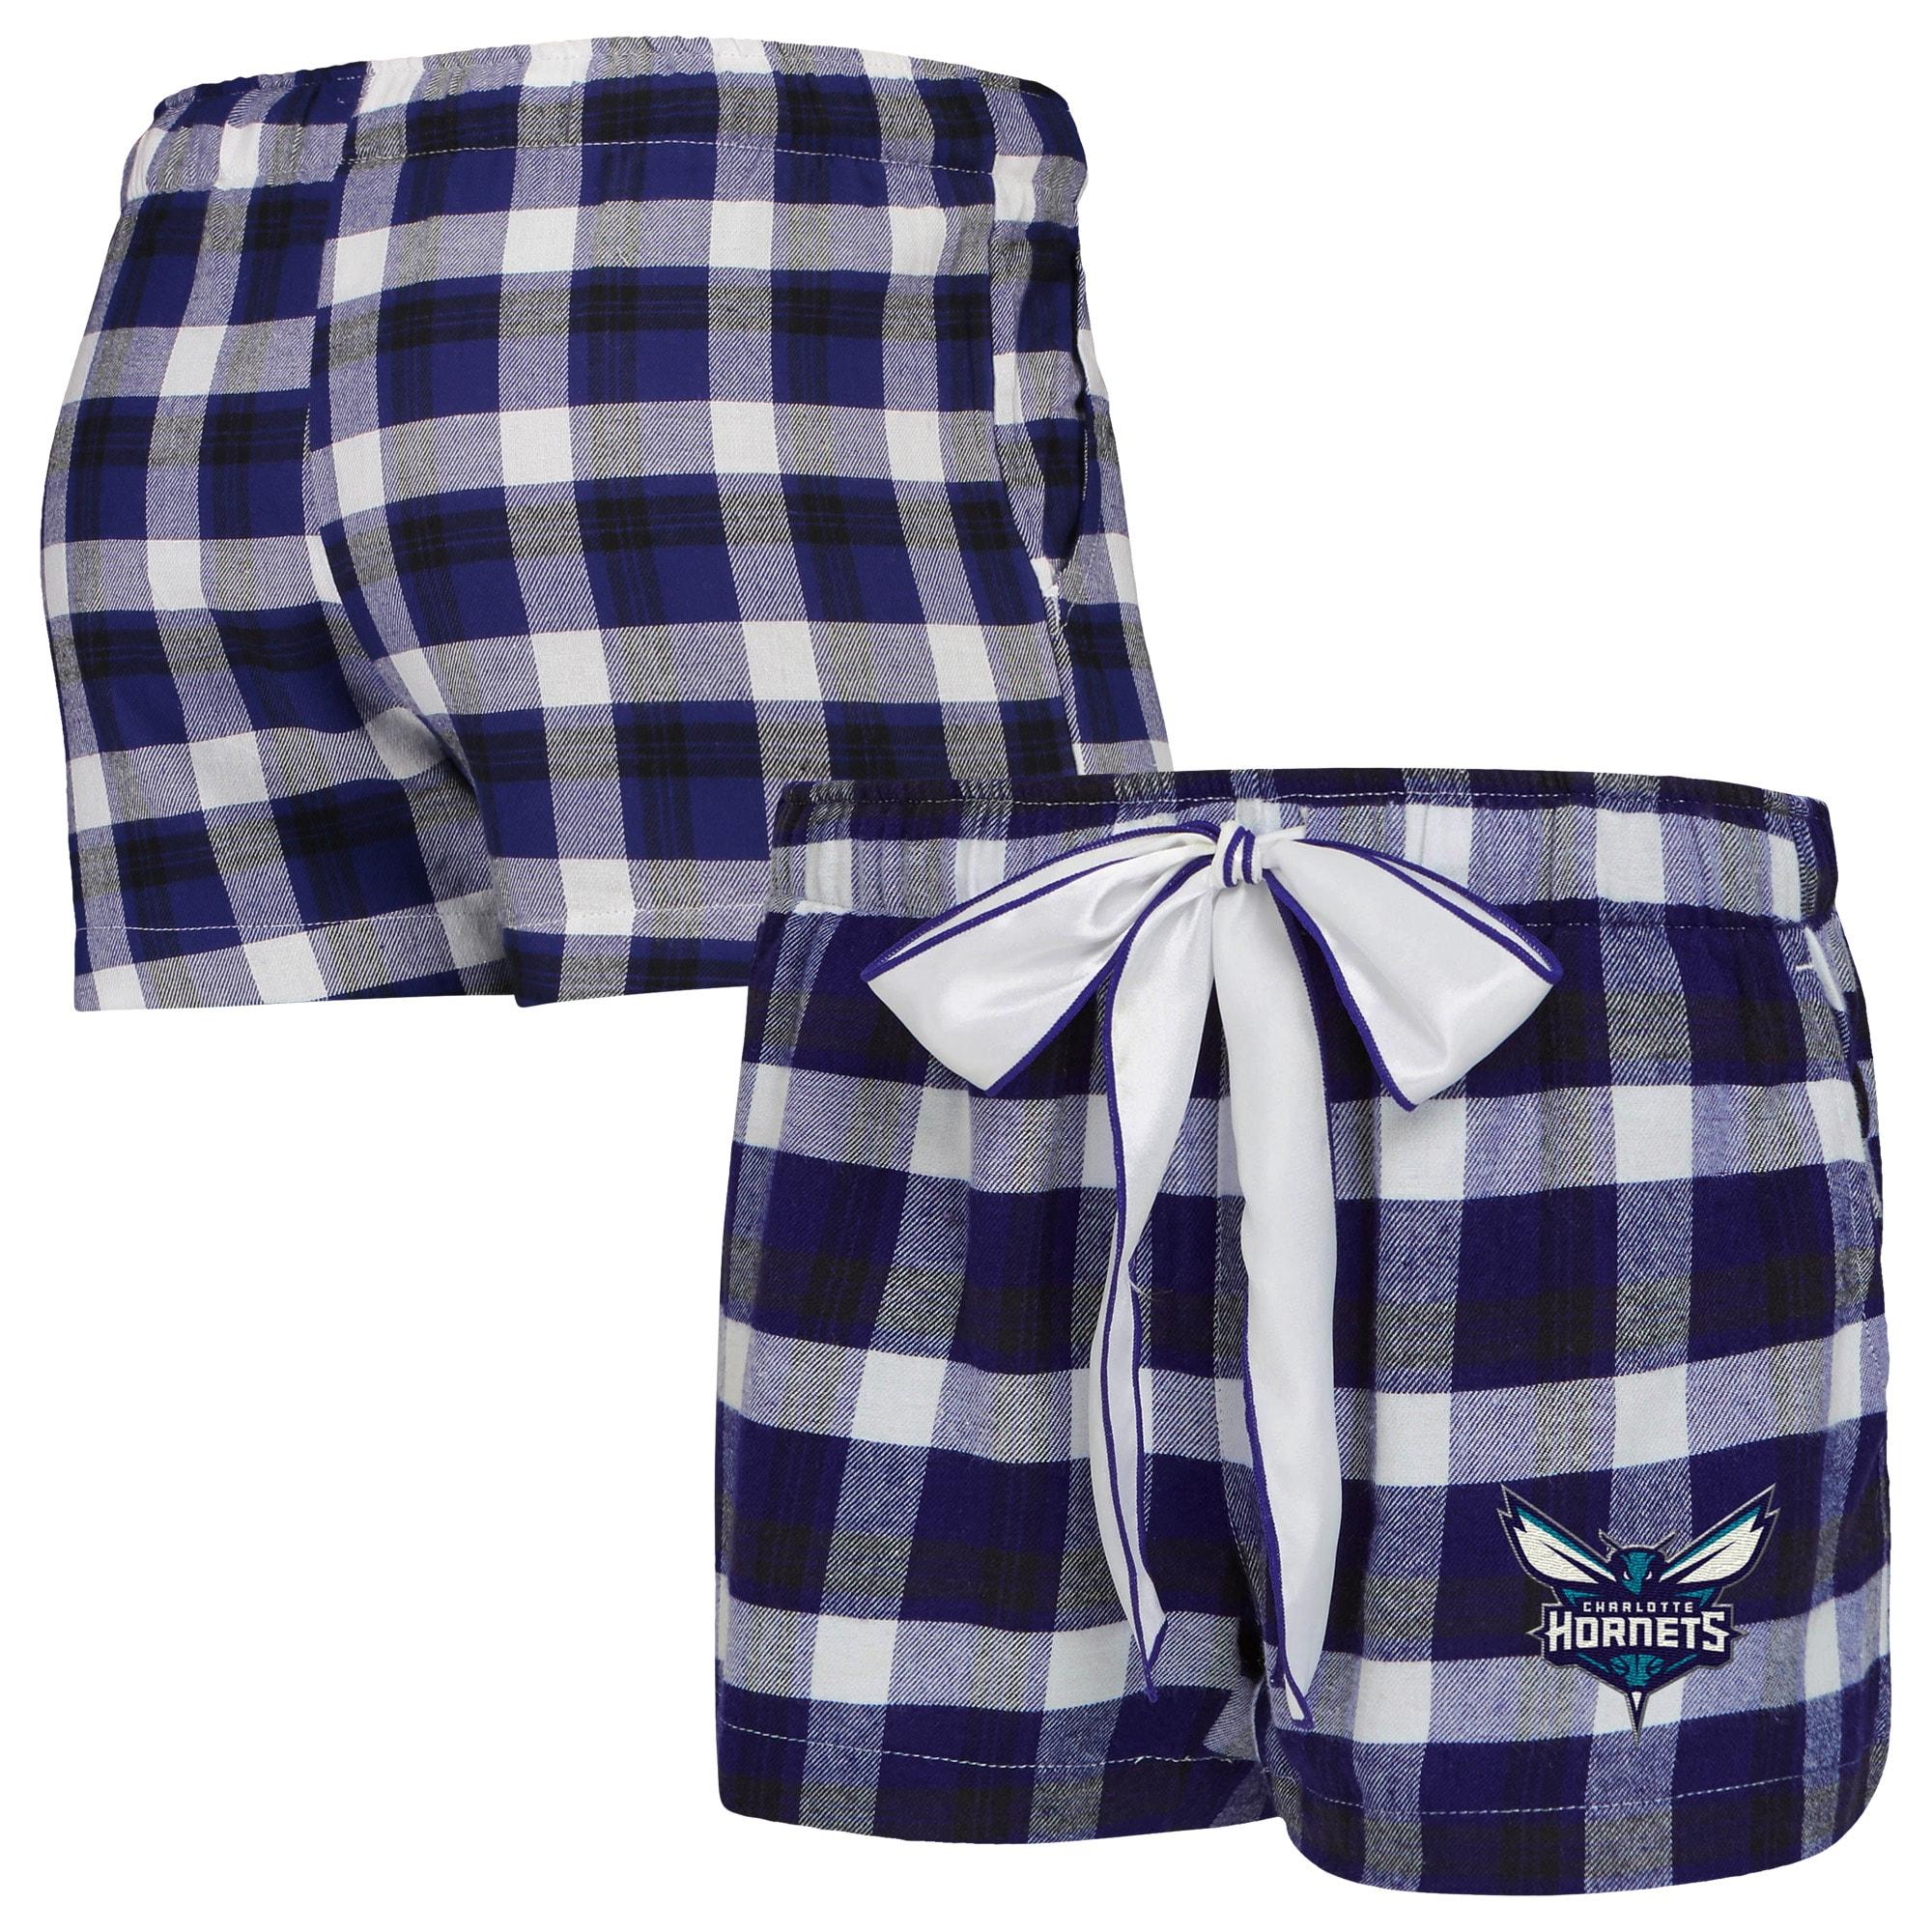 Charlotte Hornets Concepts Sport Women's Piedmont Flannel Sleep Shorts - Purple/Black